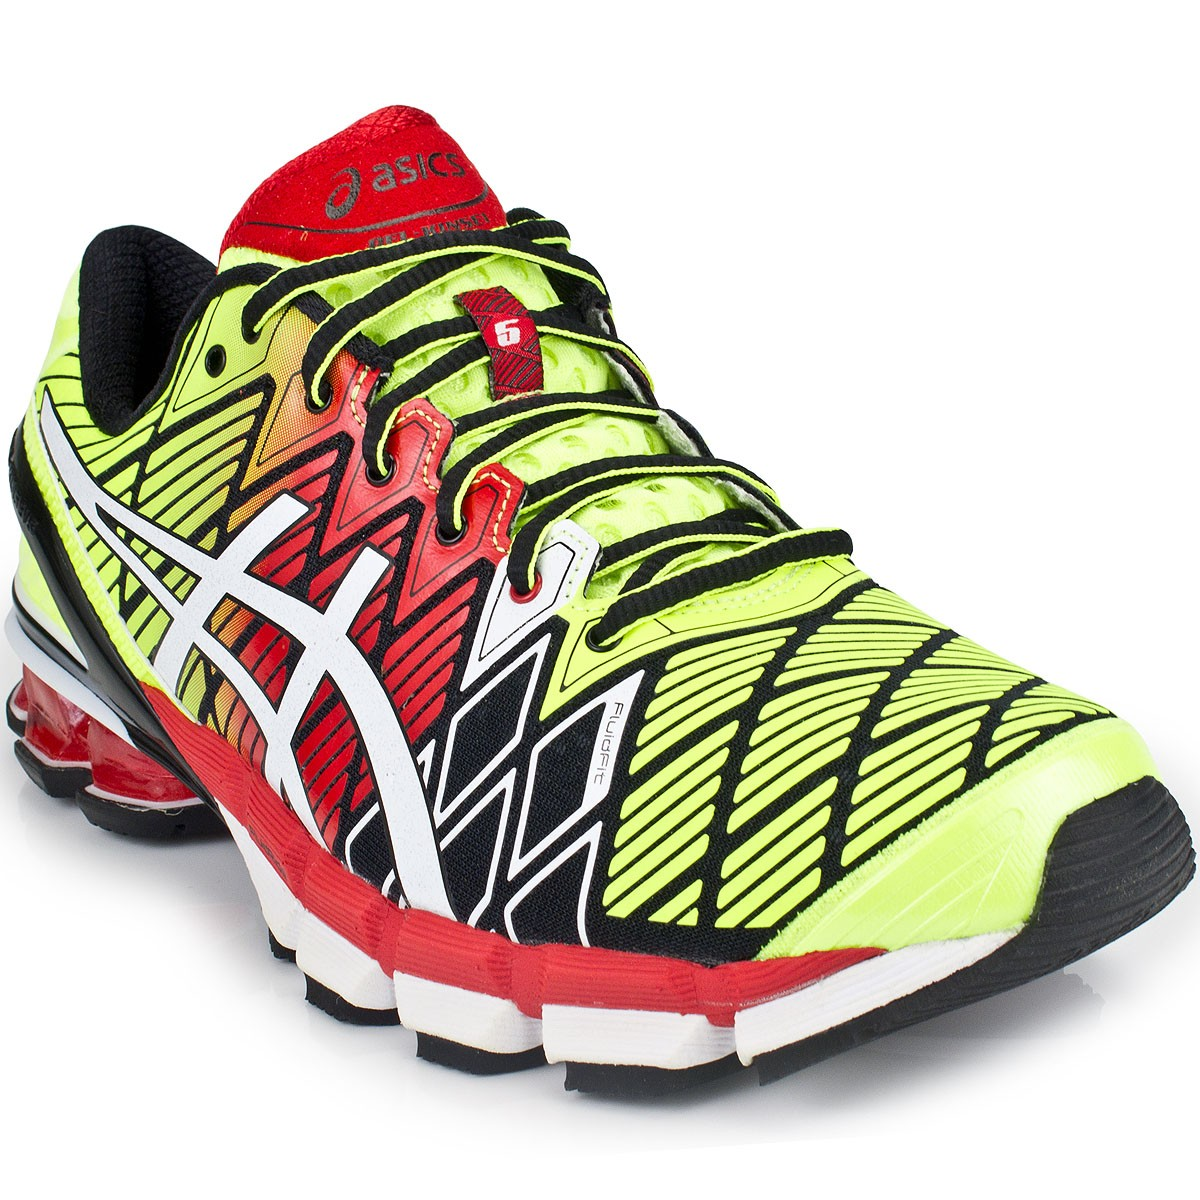 s Asics GEL Kinsei 5 Shoes RunPals